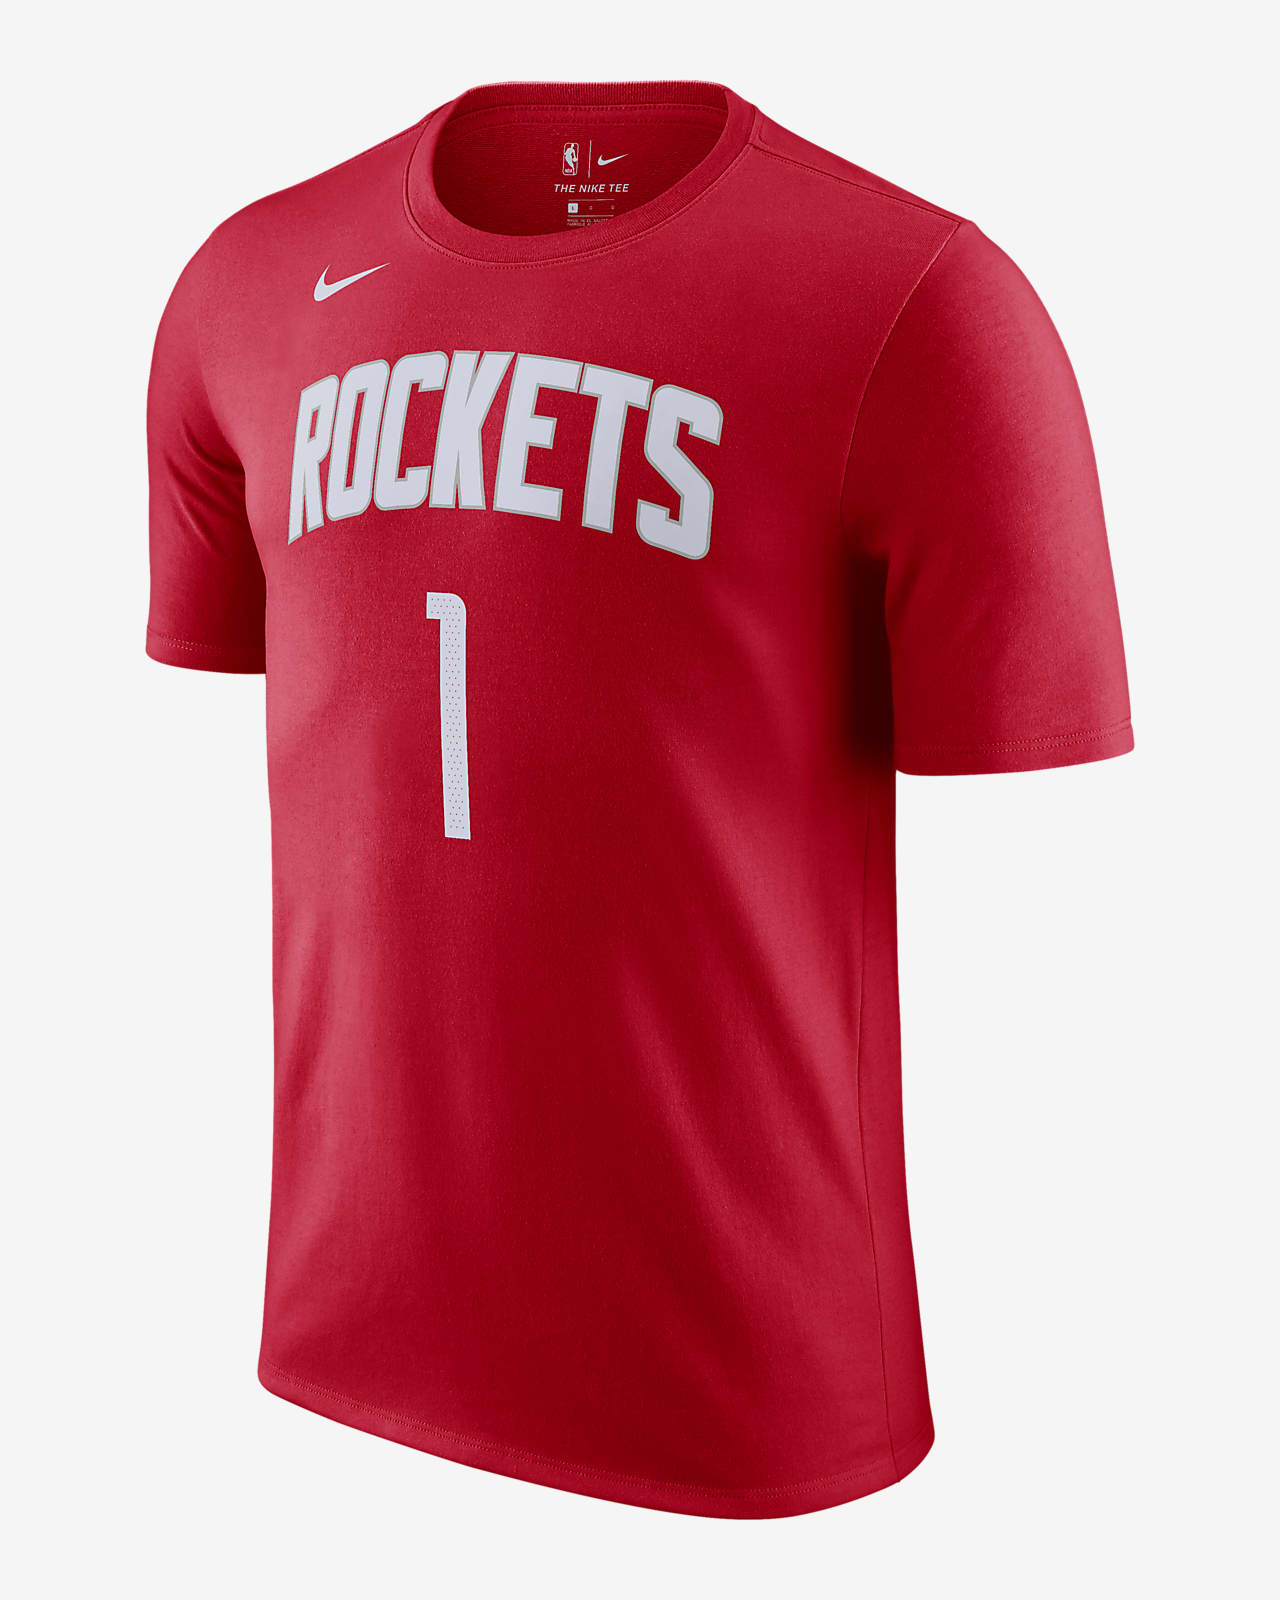 Houston Rockets Men's Nike NBA T-Shirt